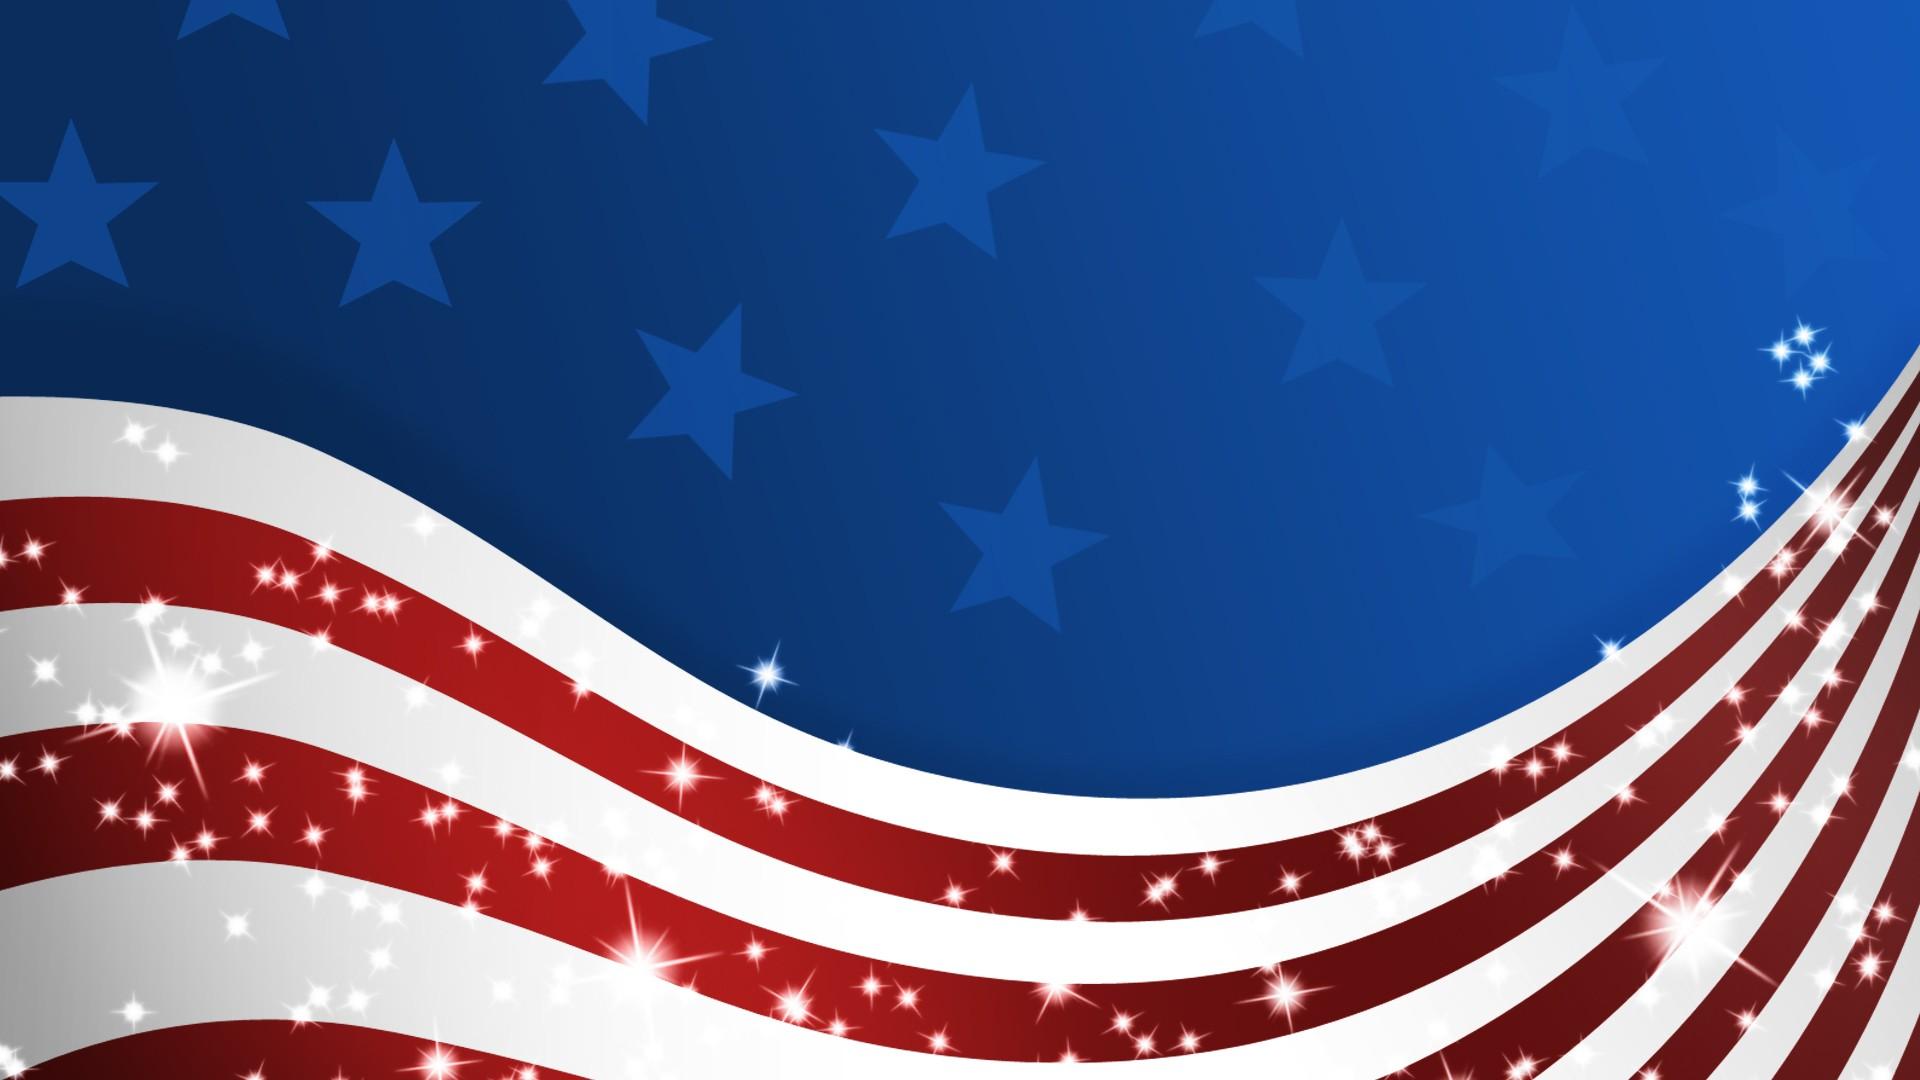 Flag Desktop Background: American Flag Wallpaper 1920x1080